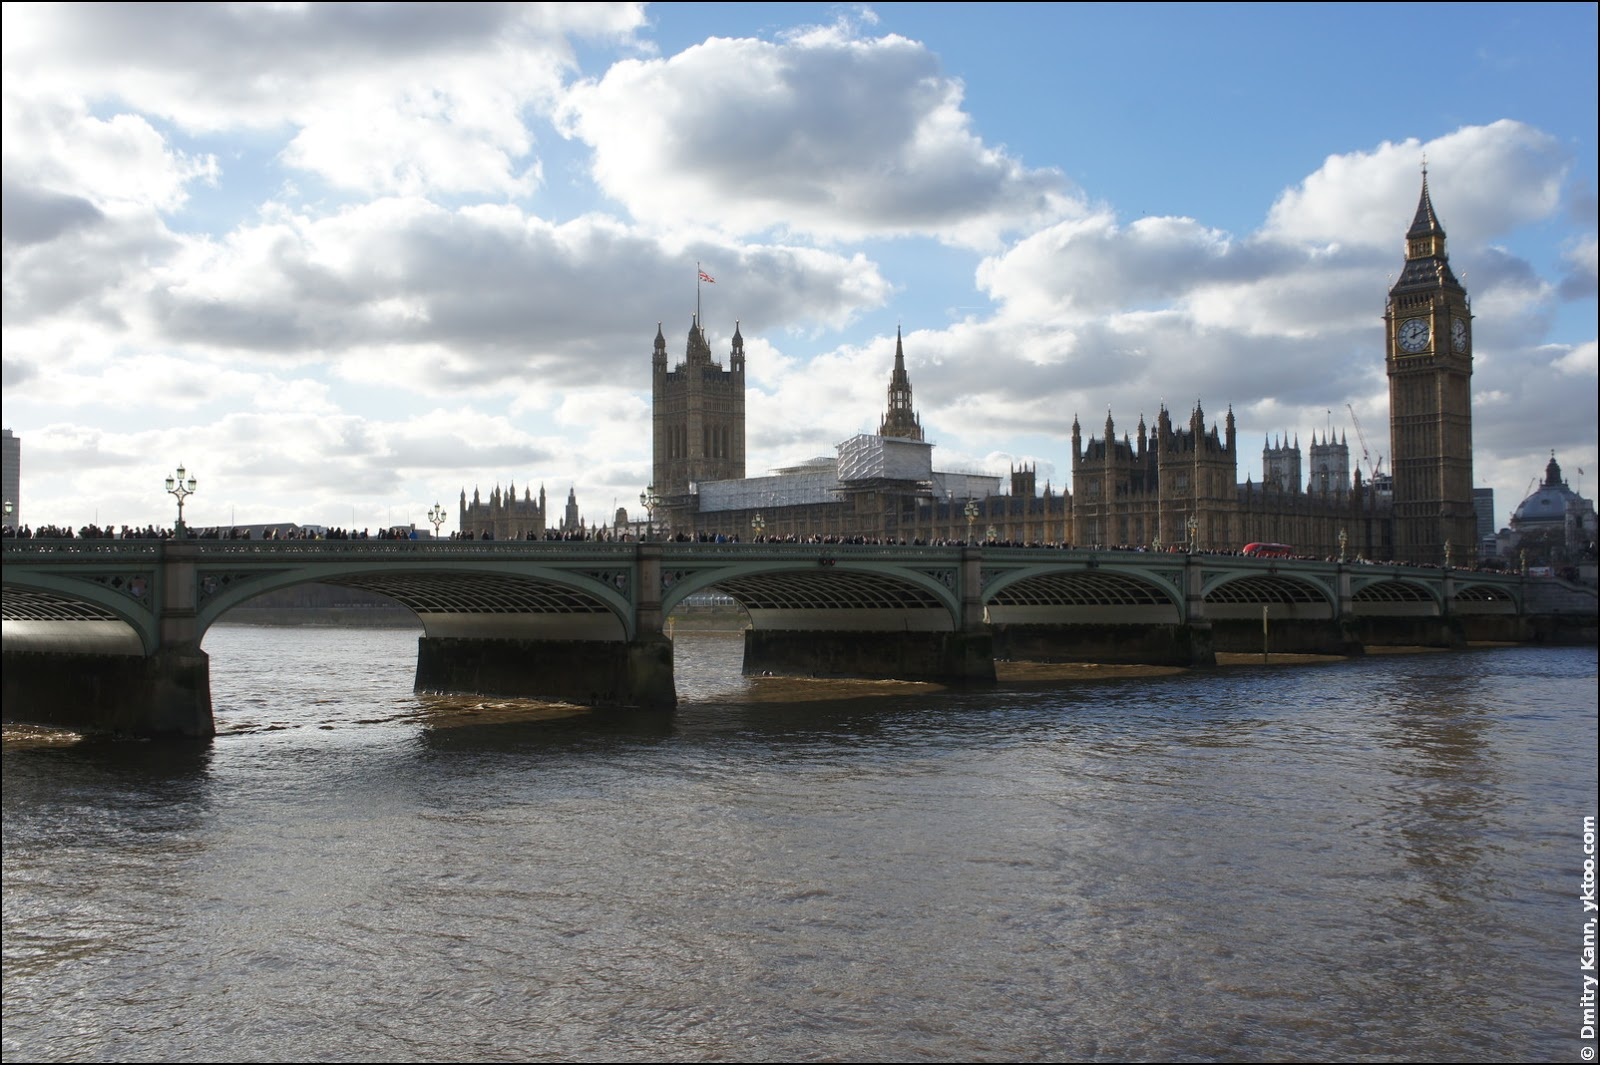 Вестминстерские мост и дворец, а также Биг-Бен.